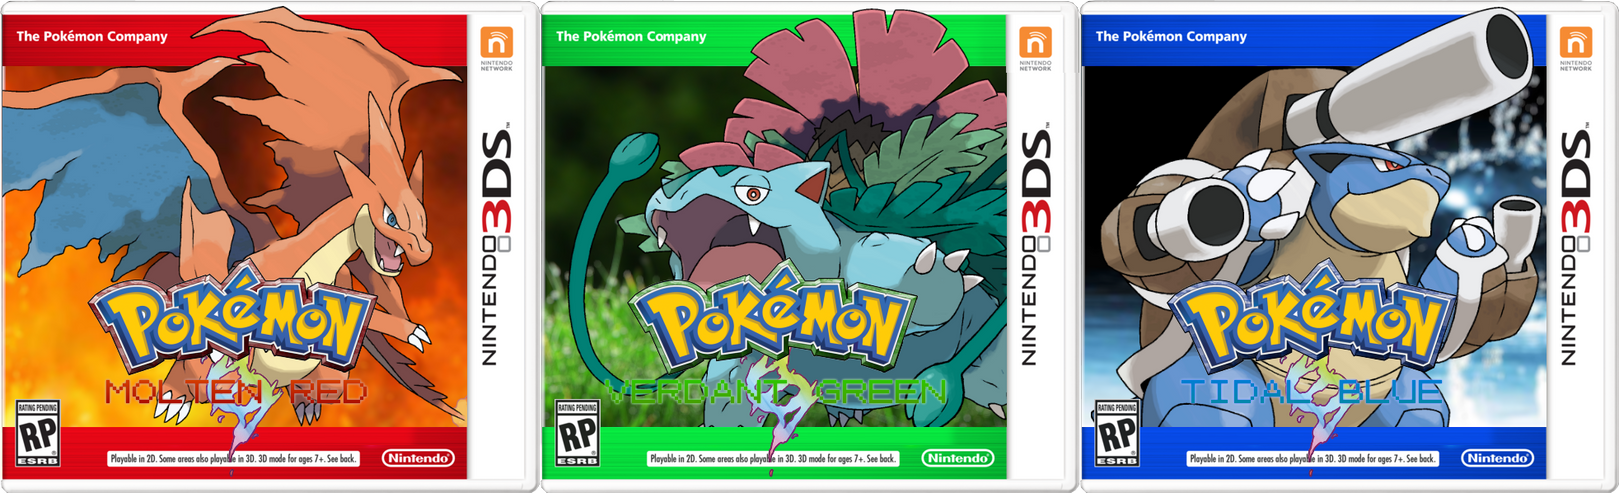 Game Freak on Pokemon: Let's Go Pikachu and Eevee postgame ...